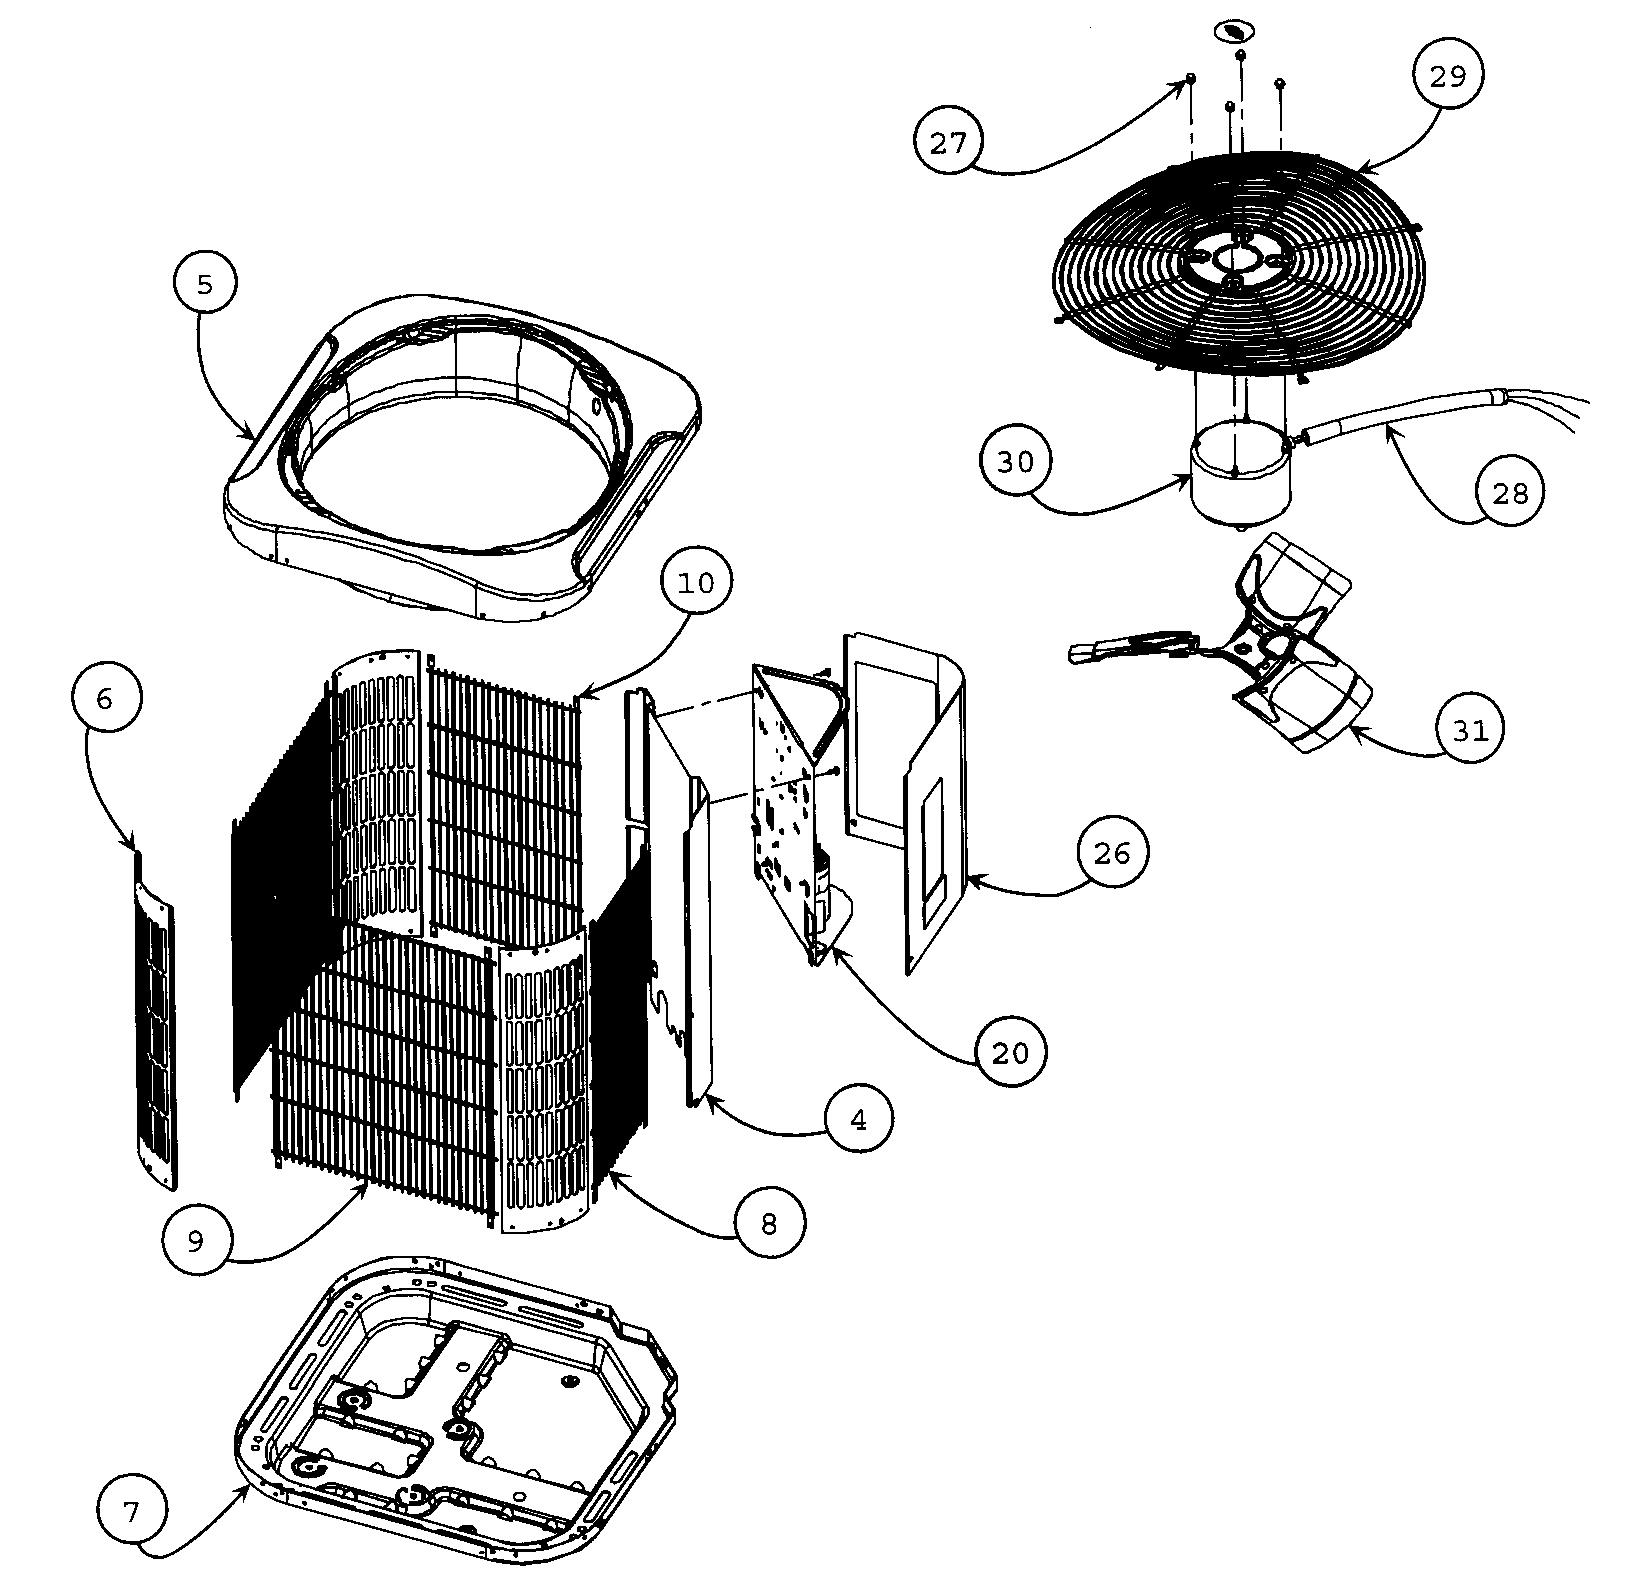 Home Air: Home Air Conditioner Parts List